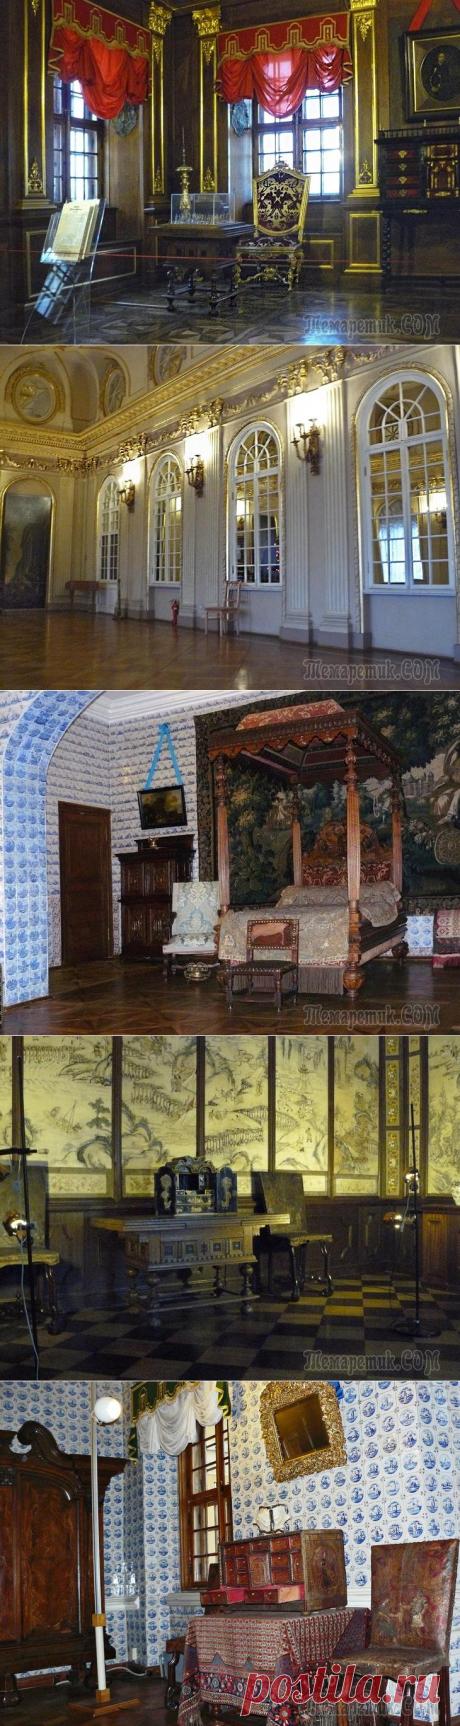 По волнам моей памяти... Меншиковский дворец